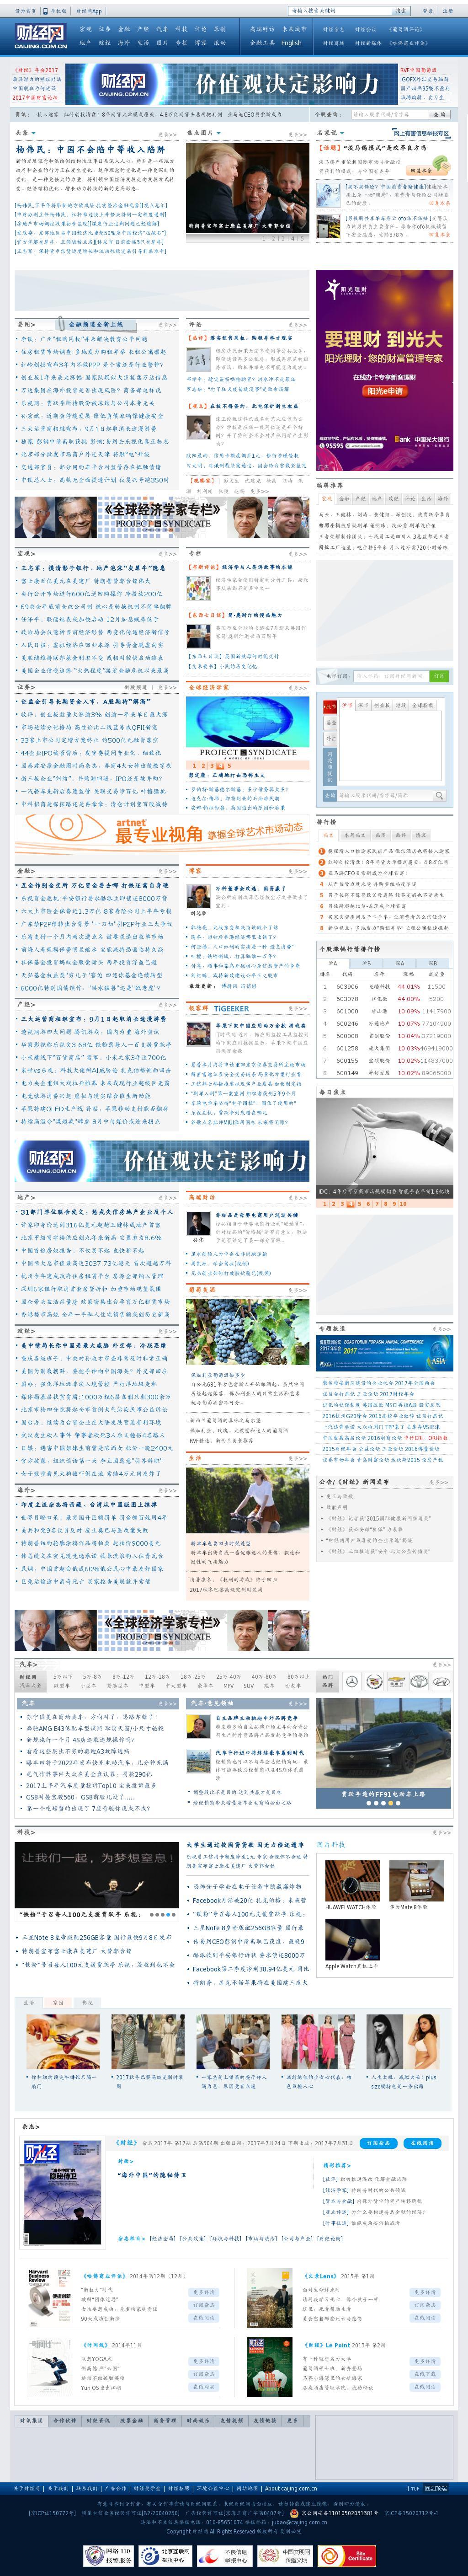 Caijing at Thursday July 27, 2017, 5:02 p.m. UTC